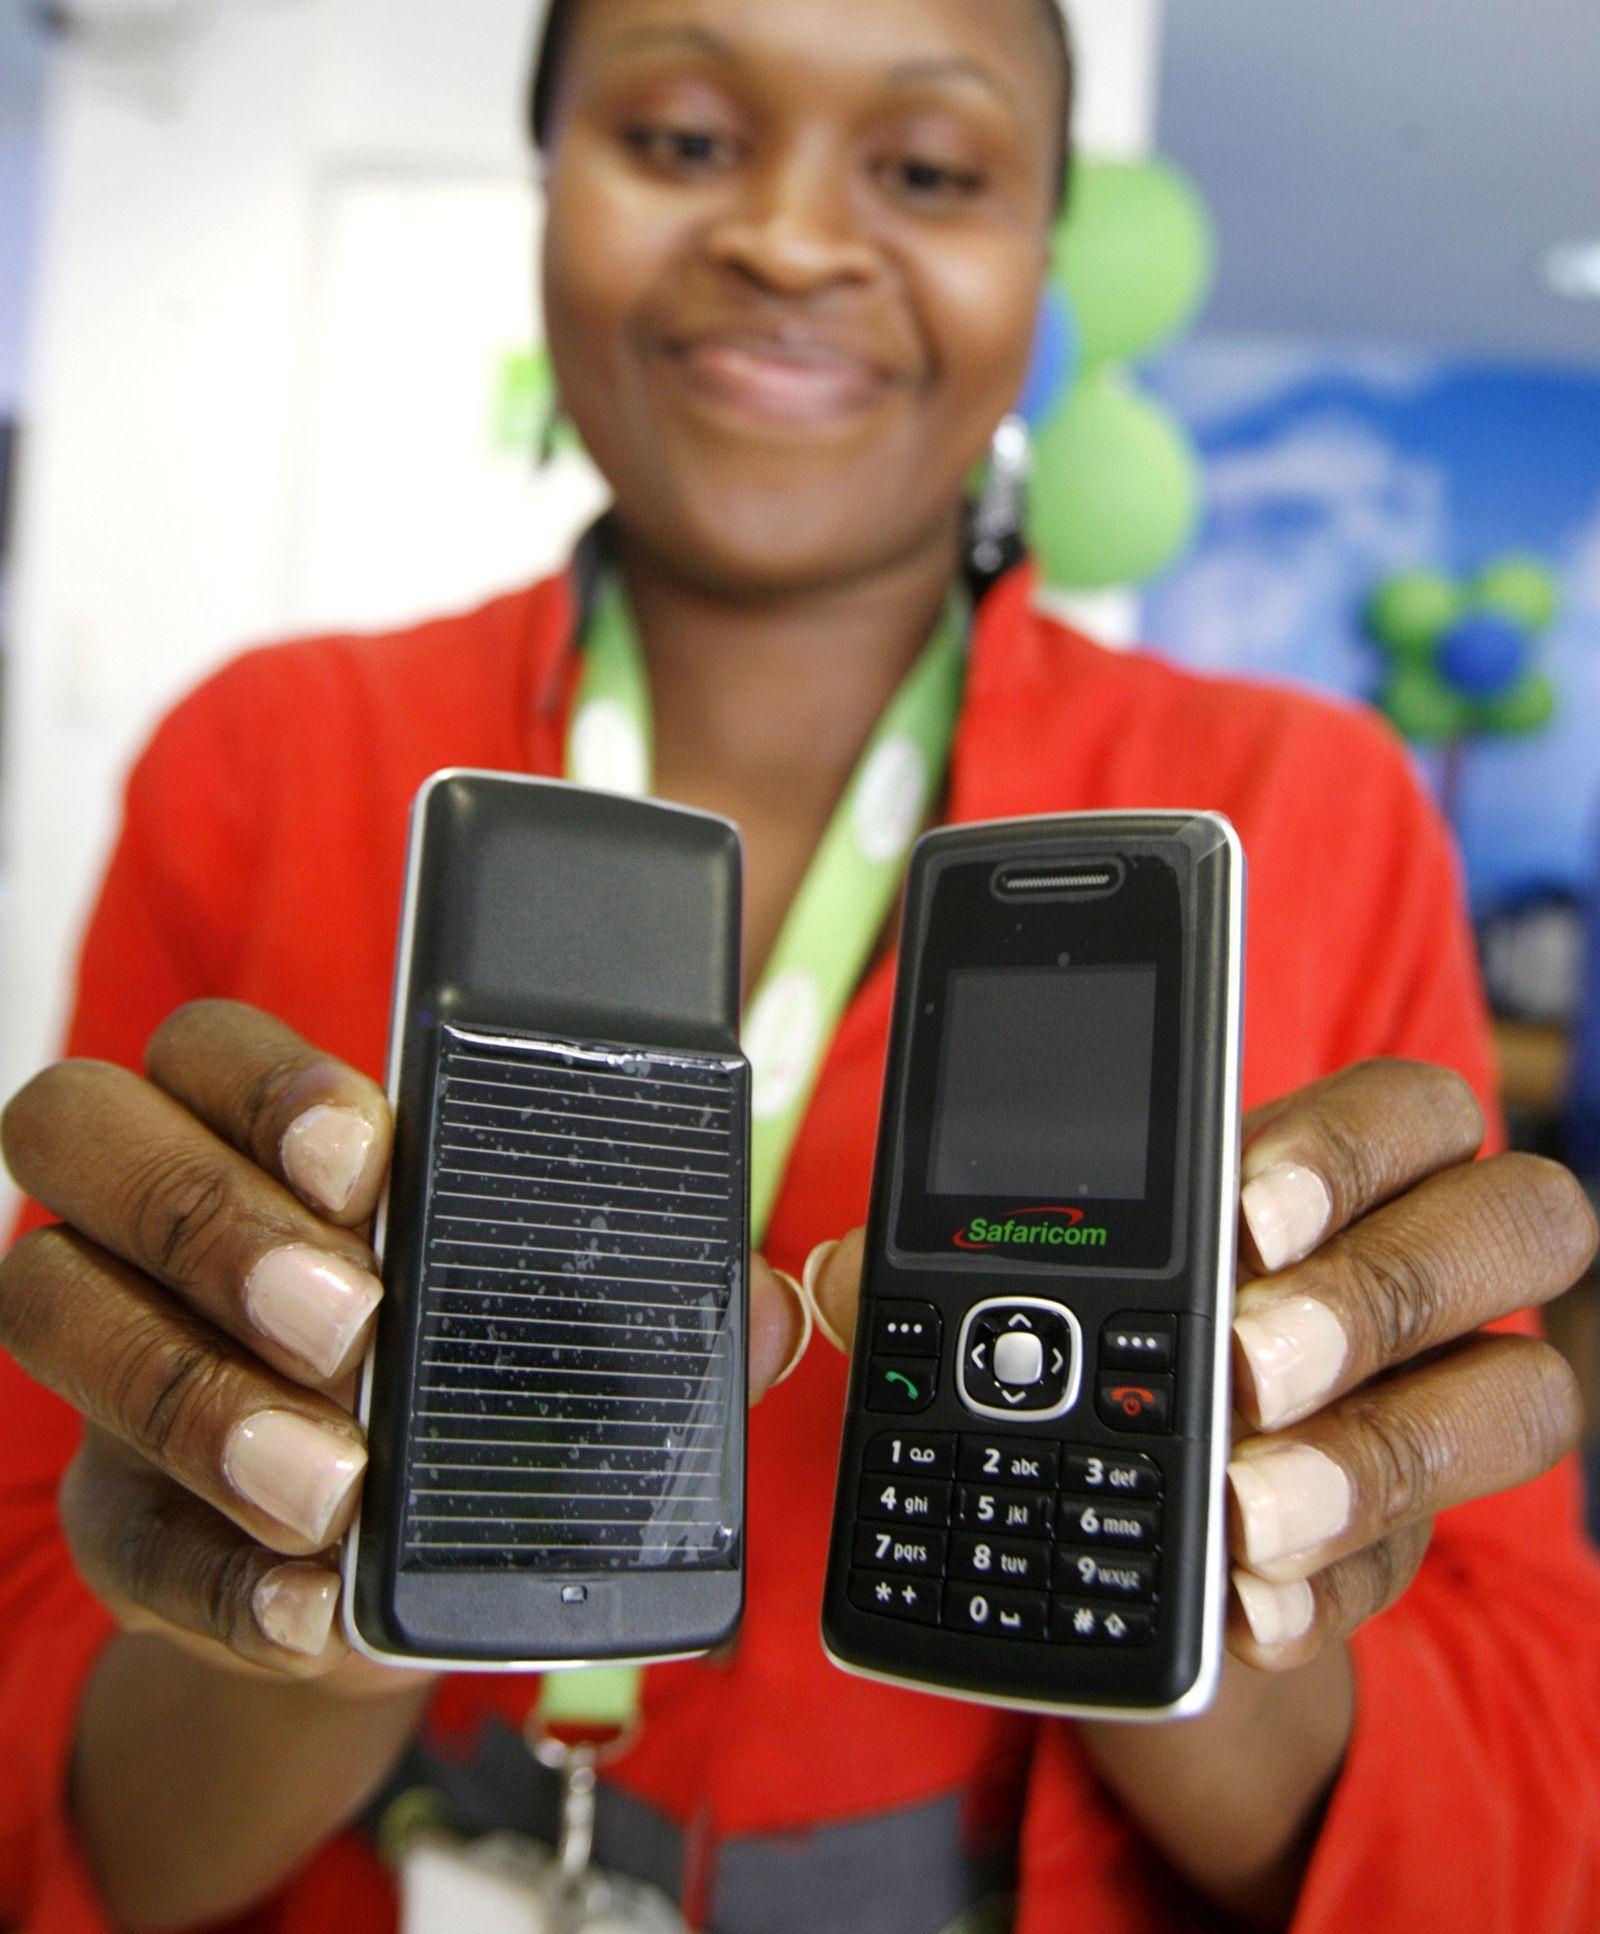 safaricom Solar-Handys